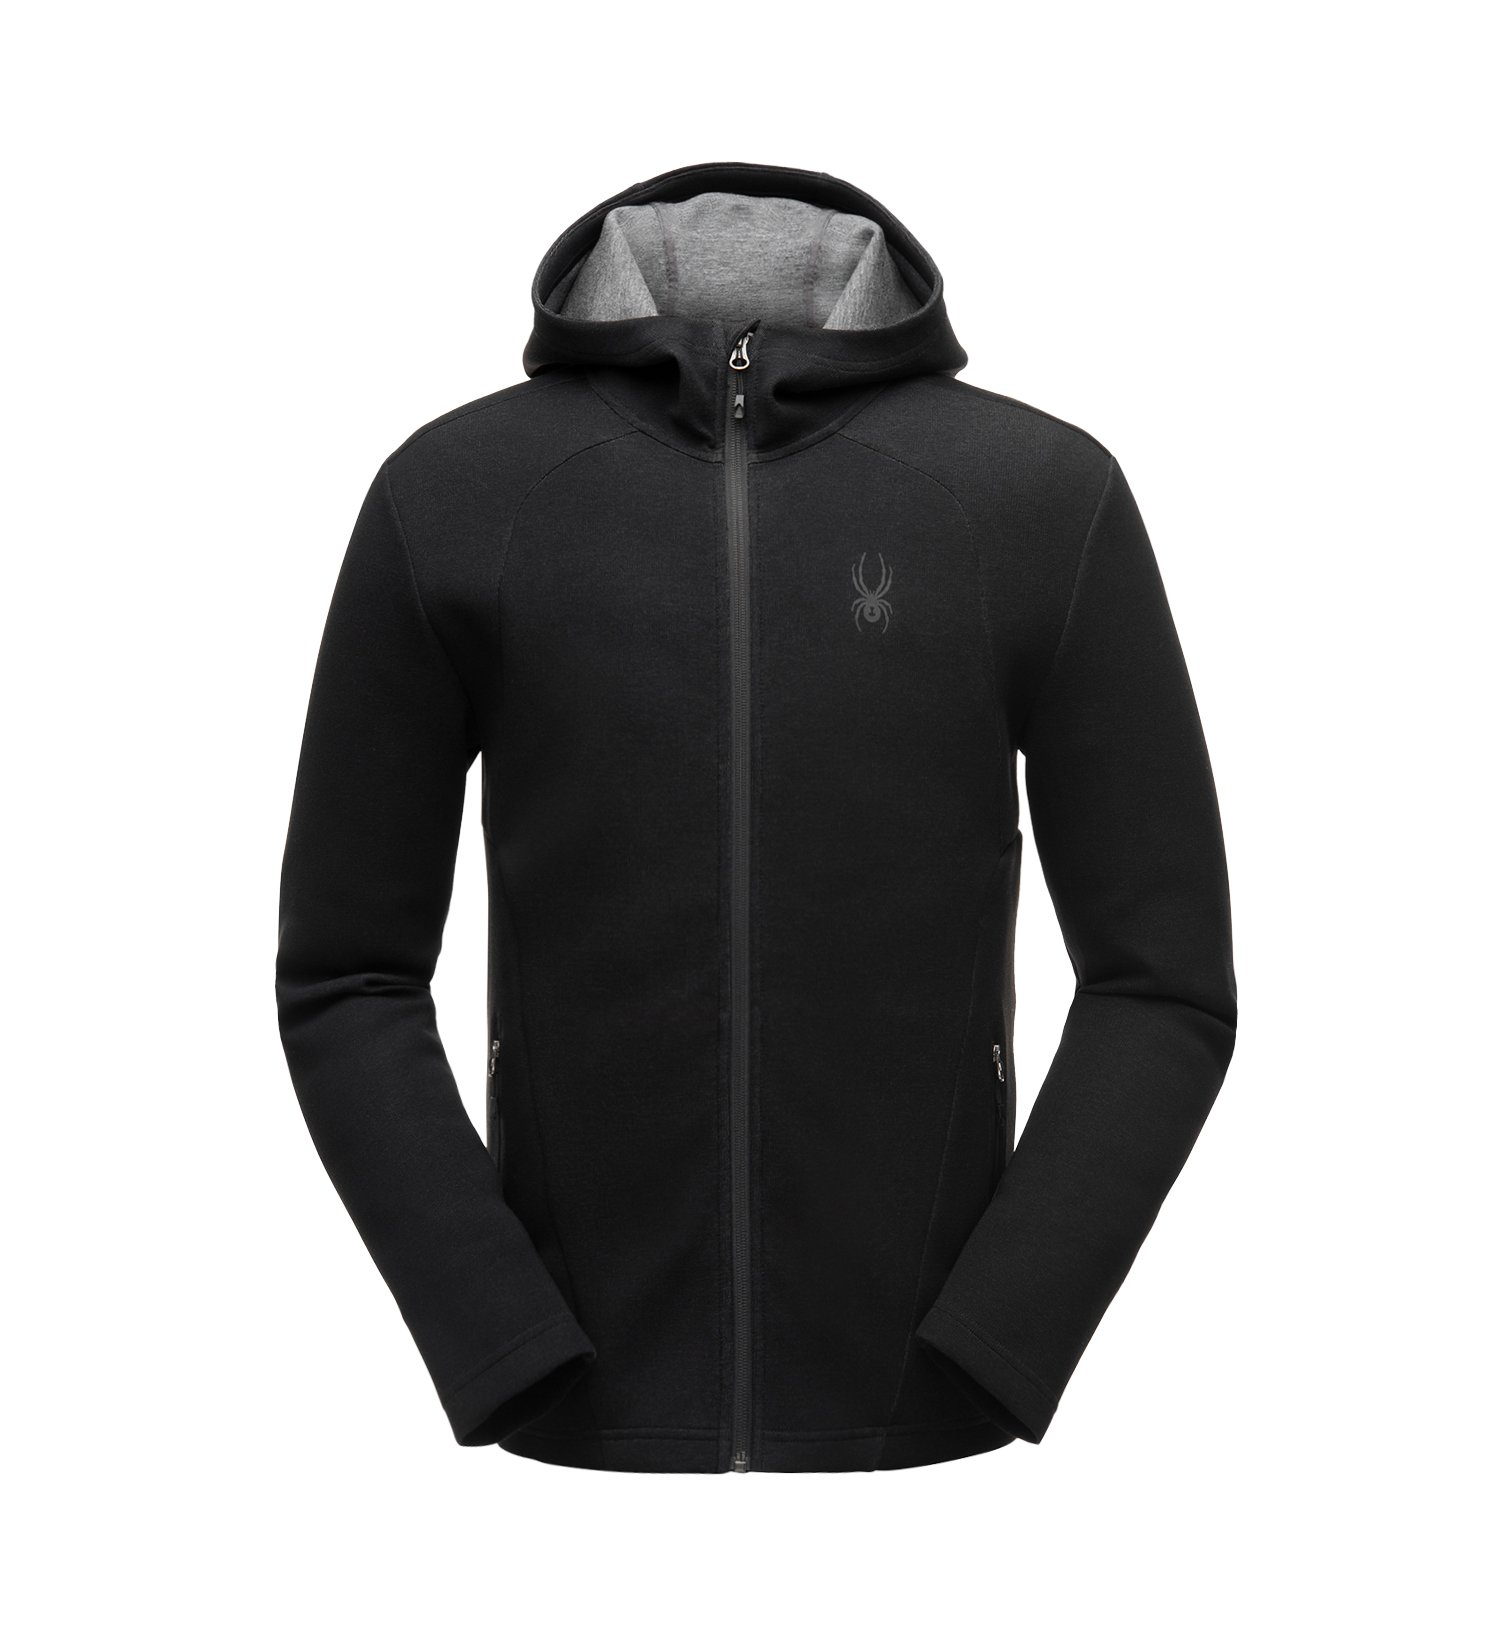 Spyder M Chance Hoody Fleece Jacket